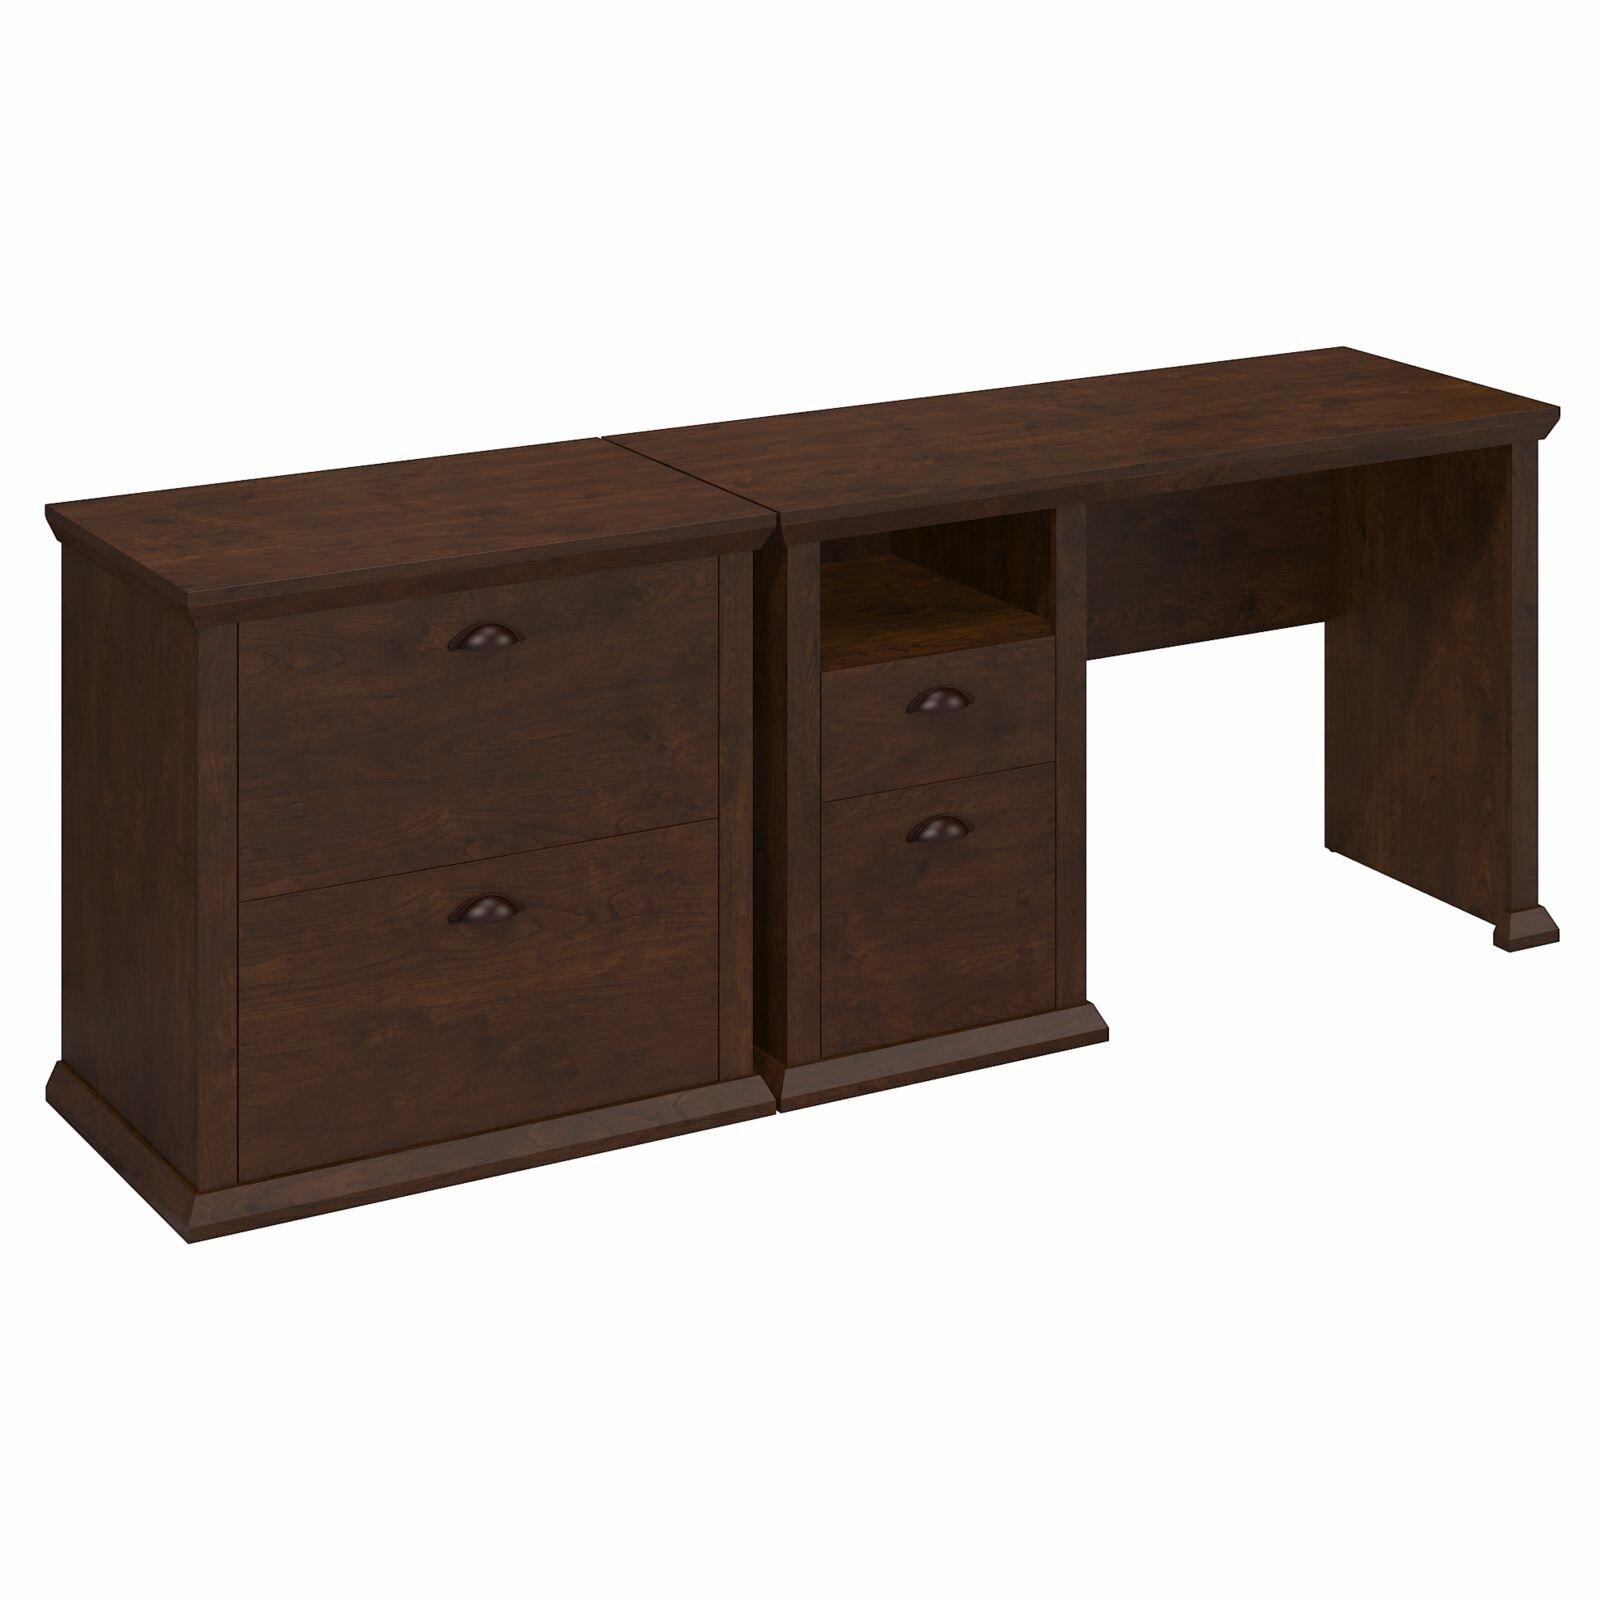 Bush furniture yorktown single pedestal desk and lateral for Bush furniture